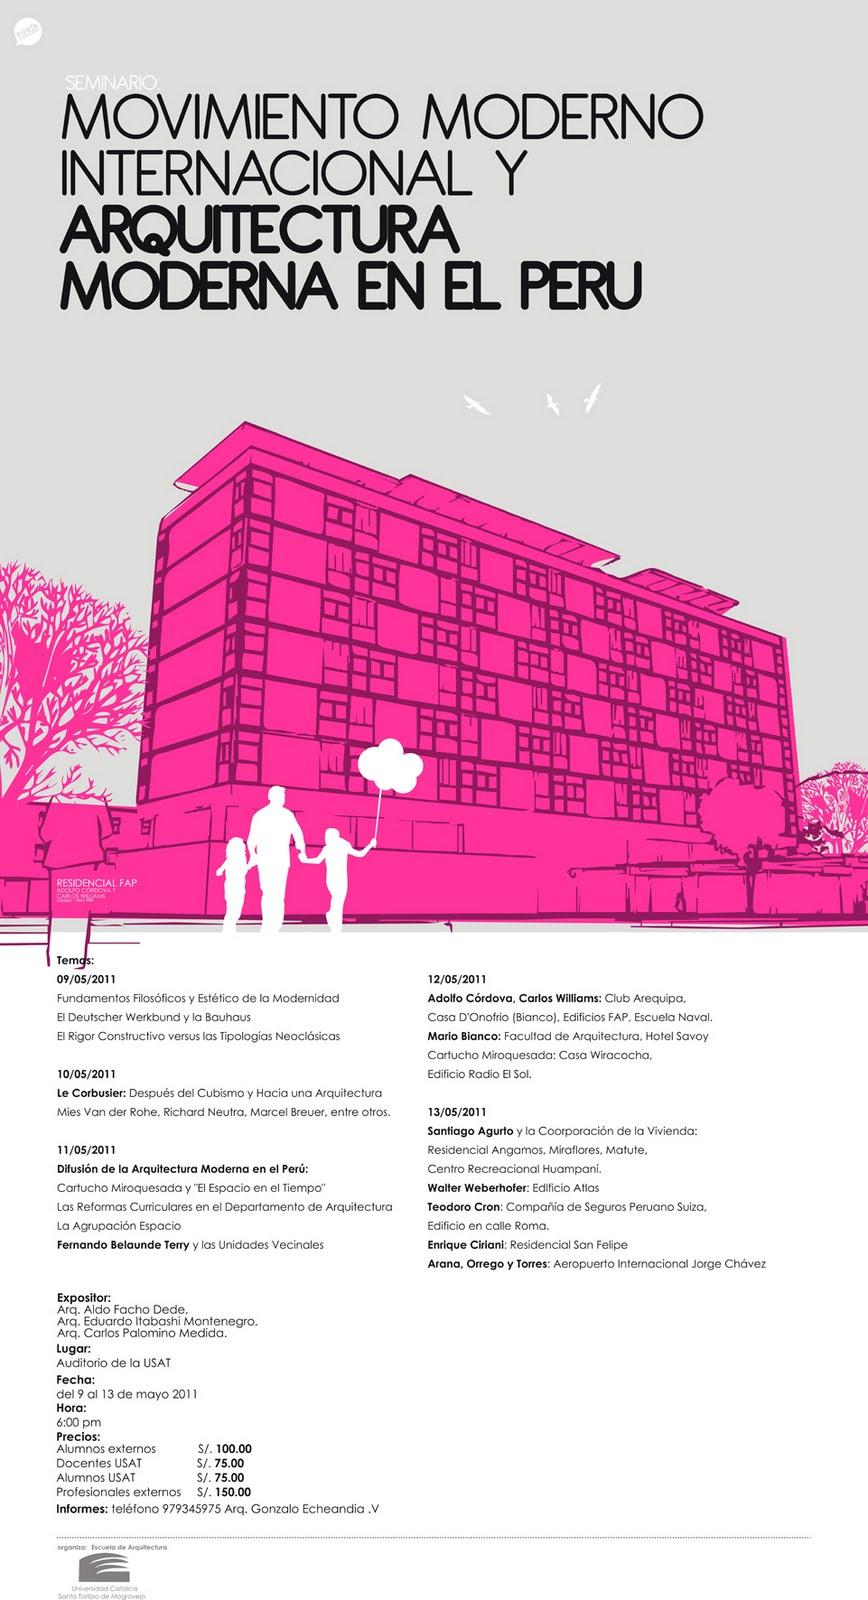 Seminario de arquitectura movimiento moderno - Movimiento moderno ...